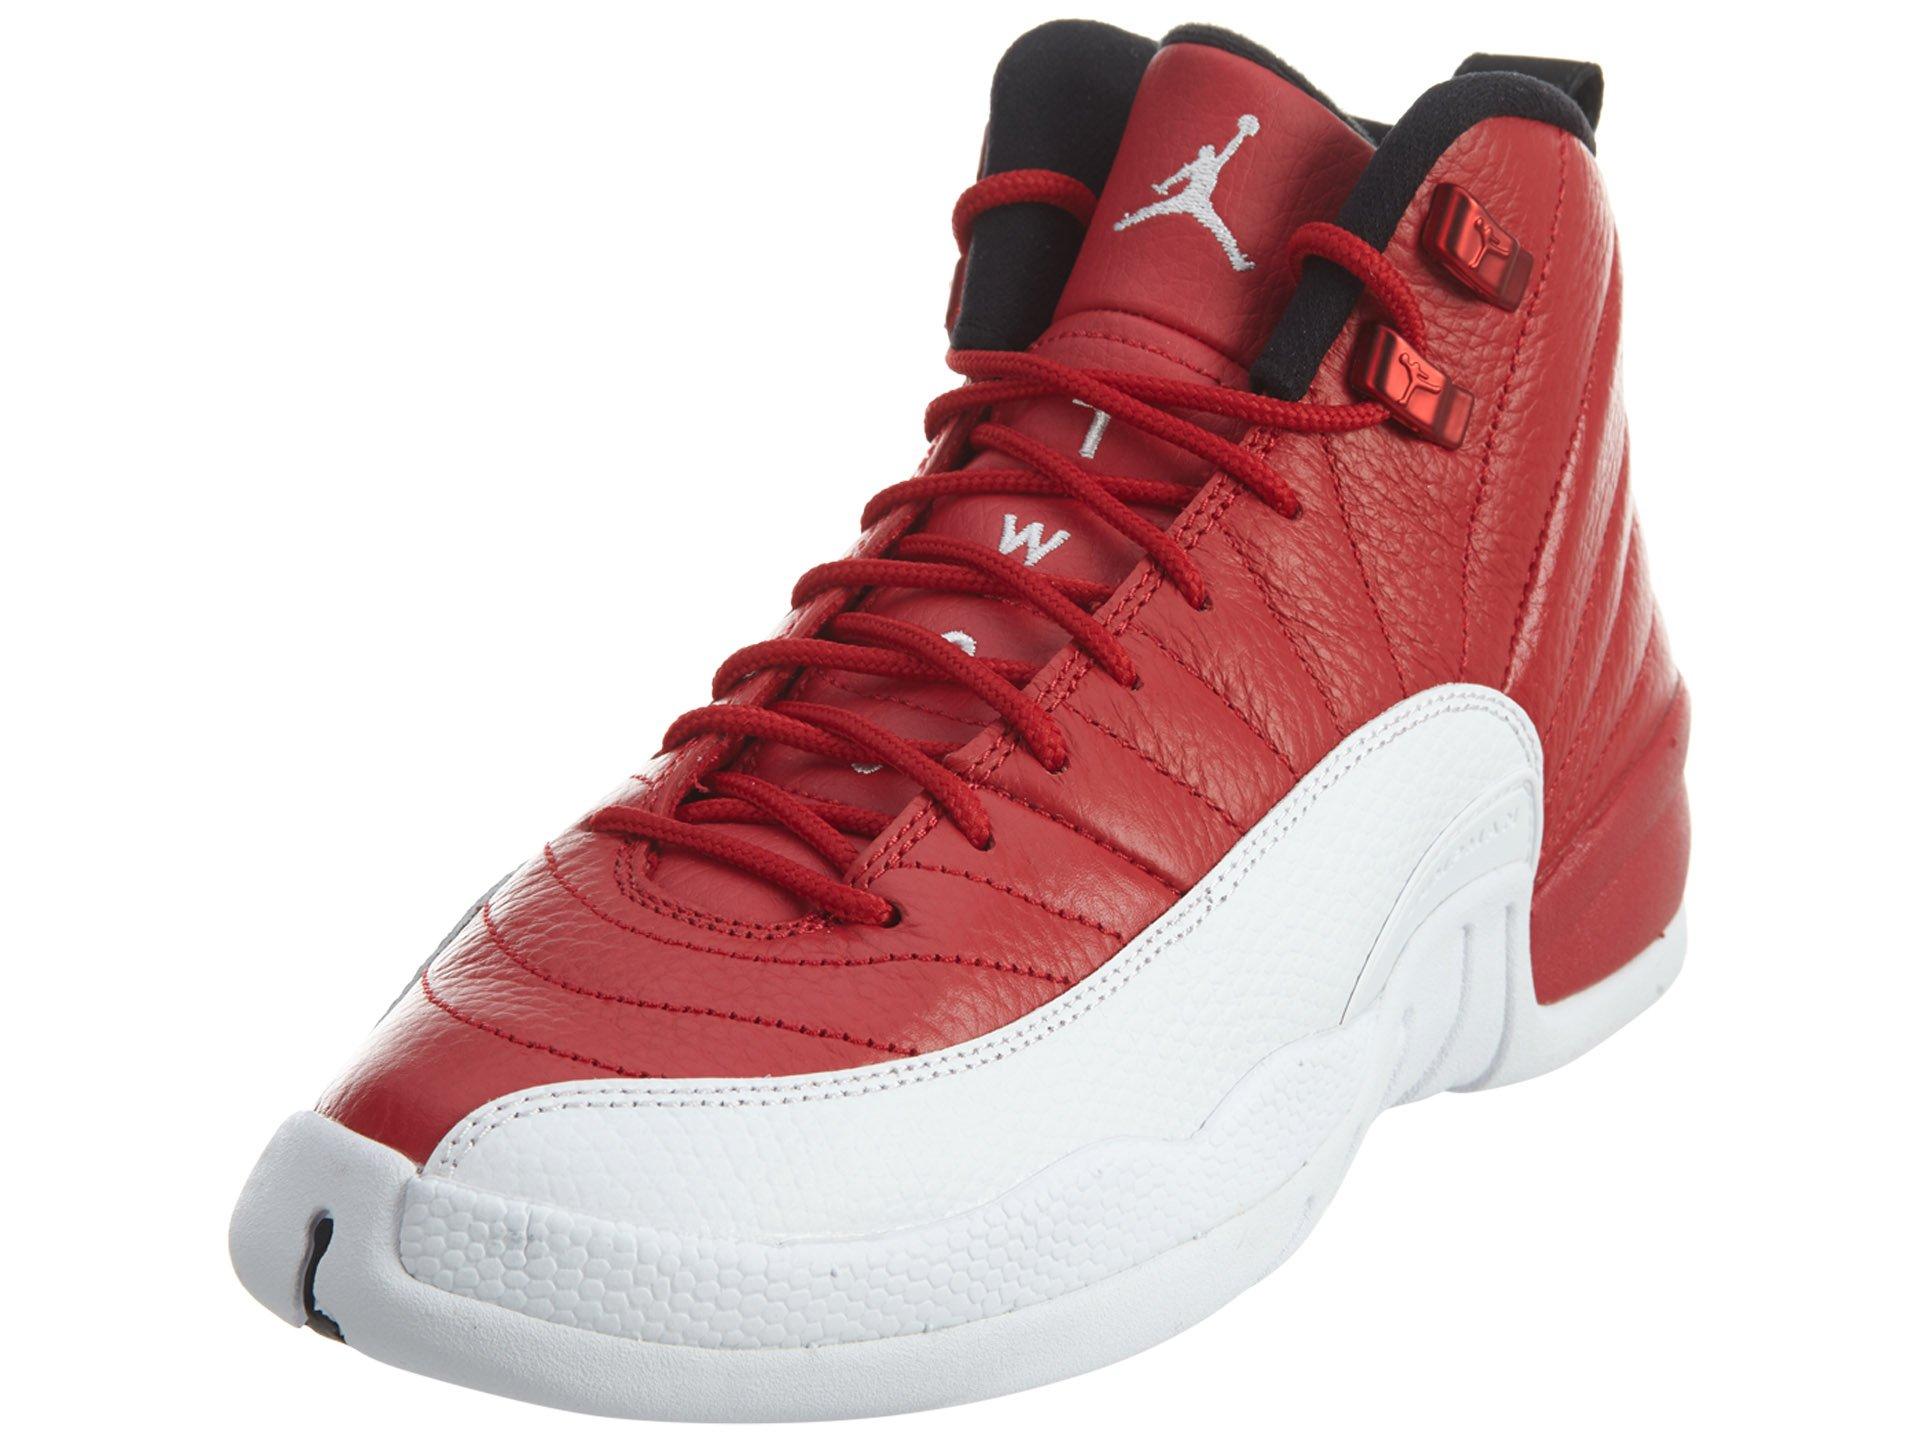 official photos da45f 9d769 Jordan Kids  Air 12 Retro Bg French Black Red   Amazon